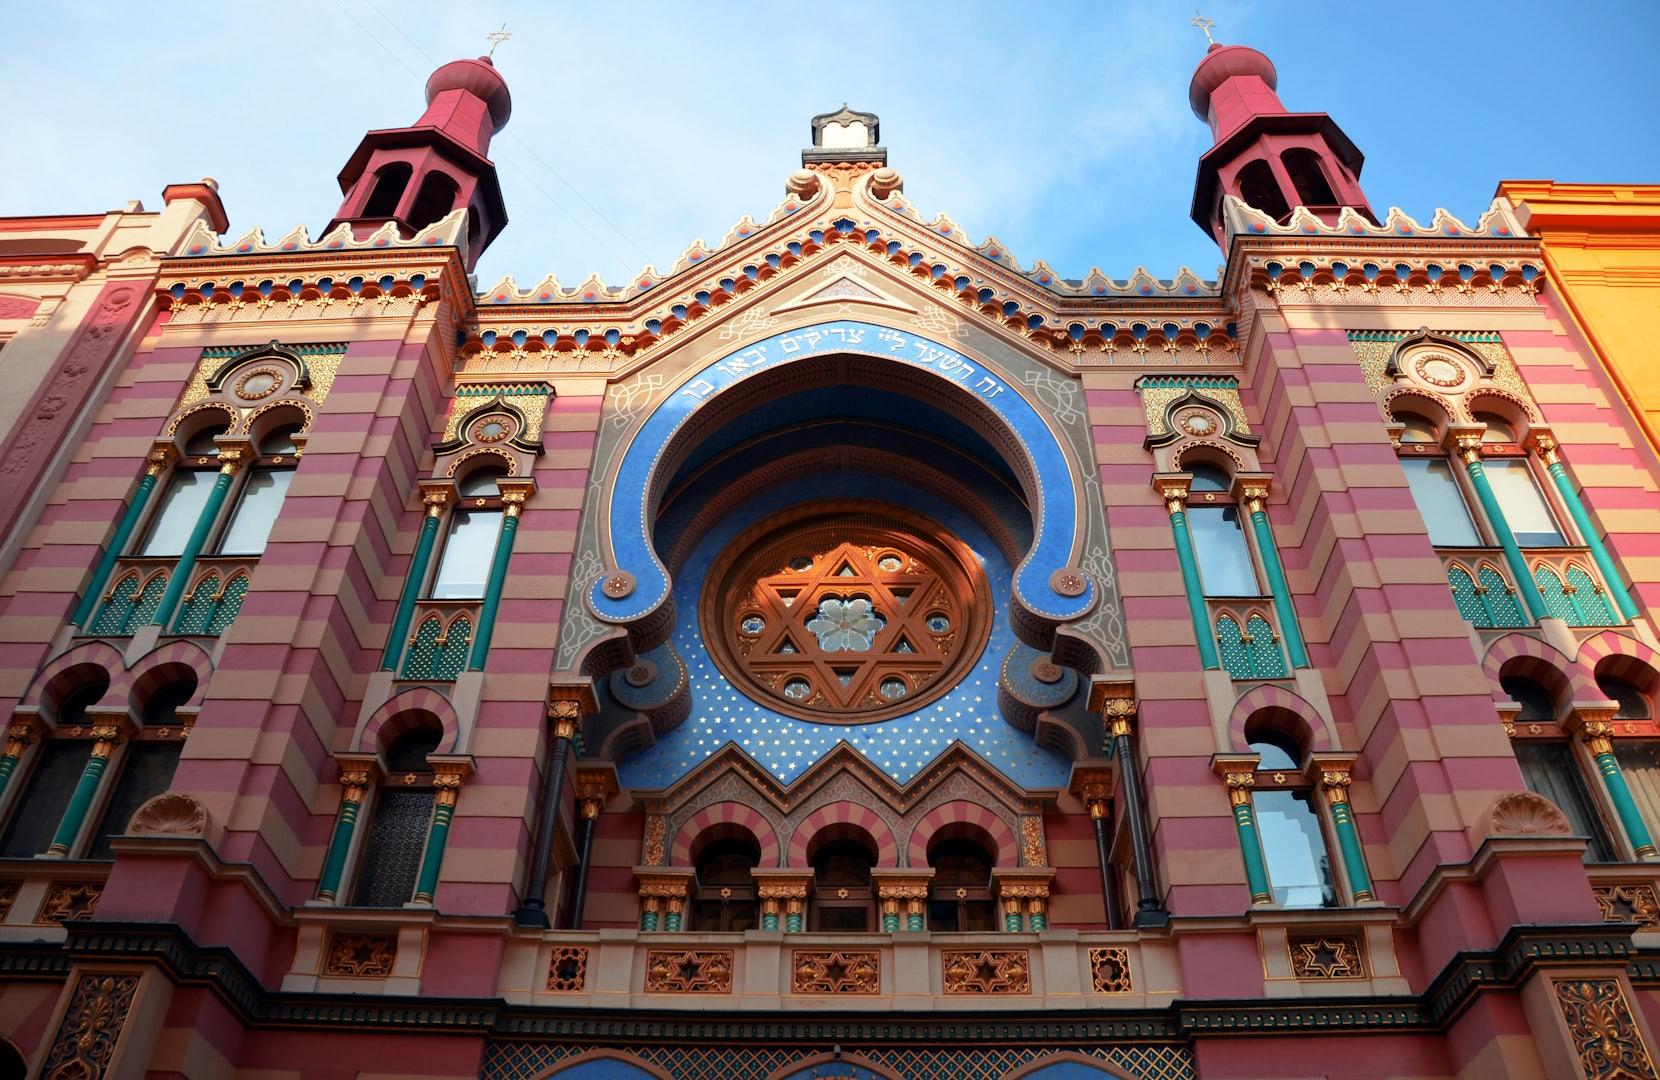 Moorish style synagogue